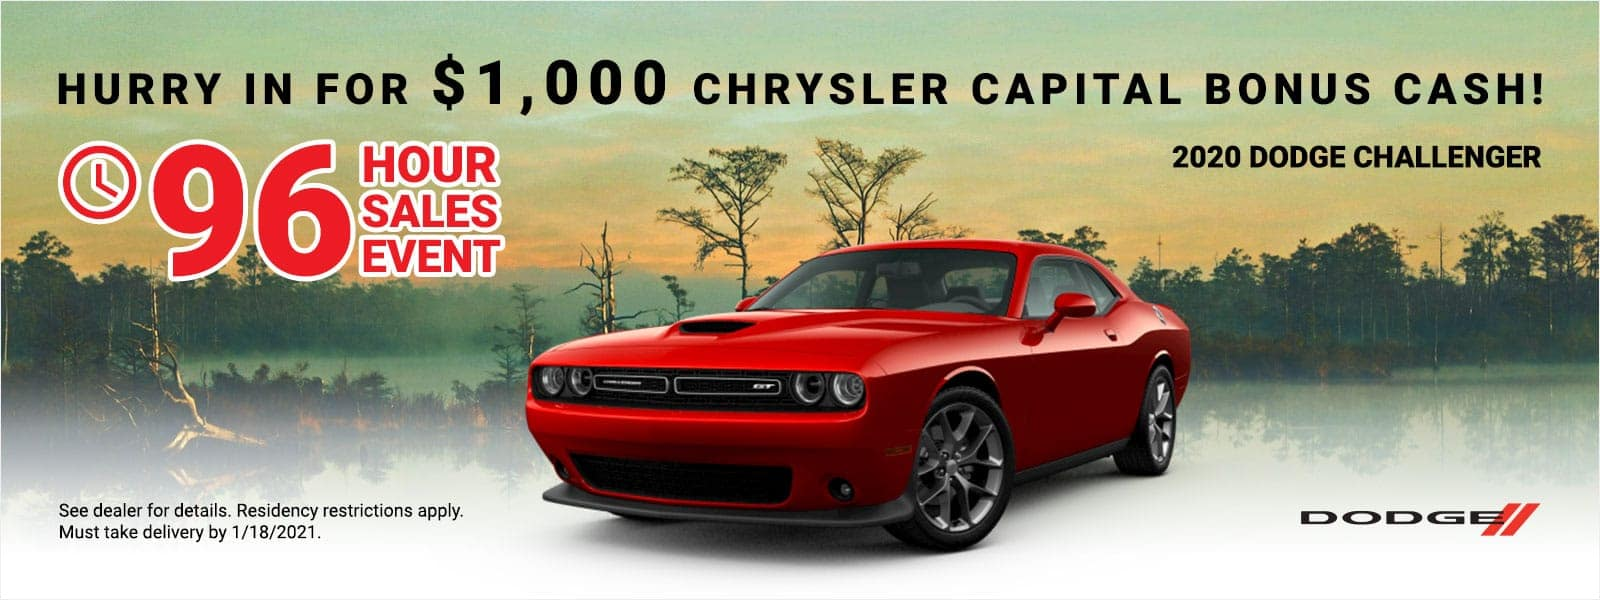 SEBC-2020-Dodge-Challenger